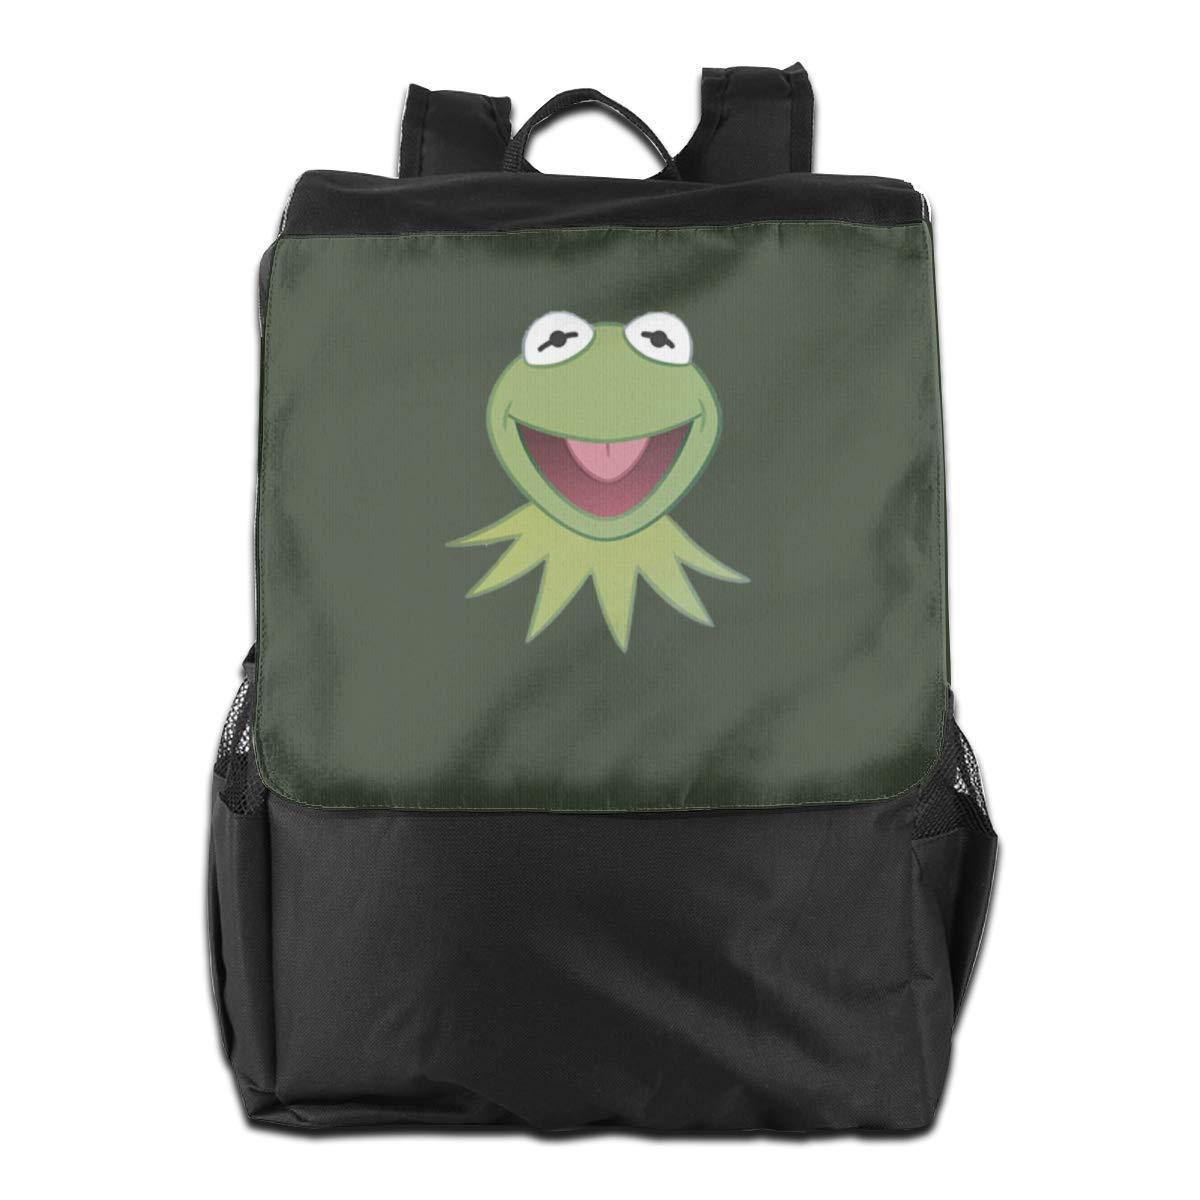 Artistic Dream Kermit The Frog Face ファッションプリント オックスフォード トラベルバックパック ショルダーバッグ One Size ブラック B07KK8F1HQ